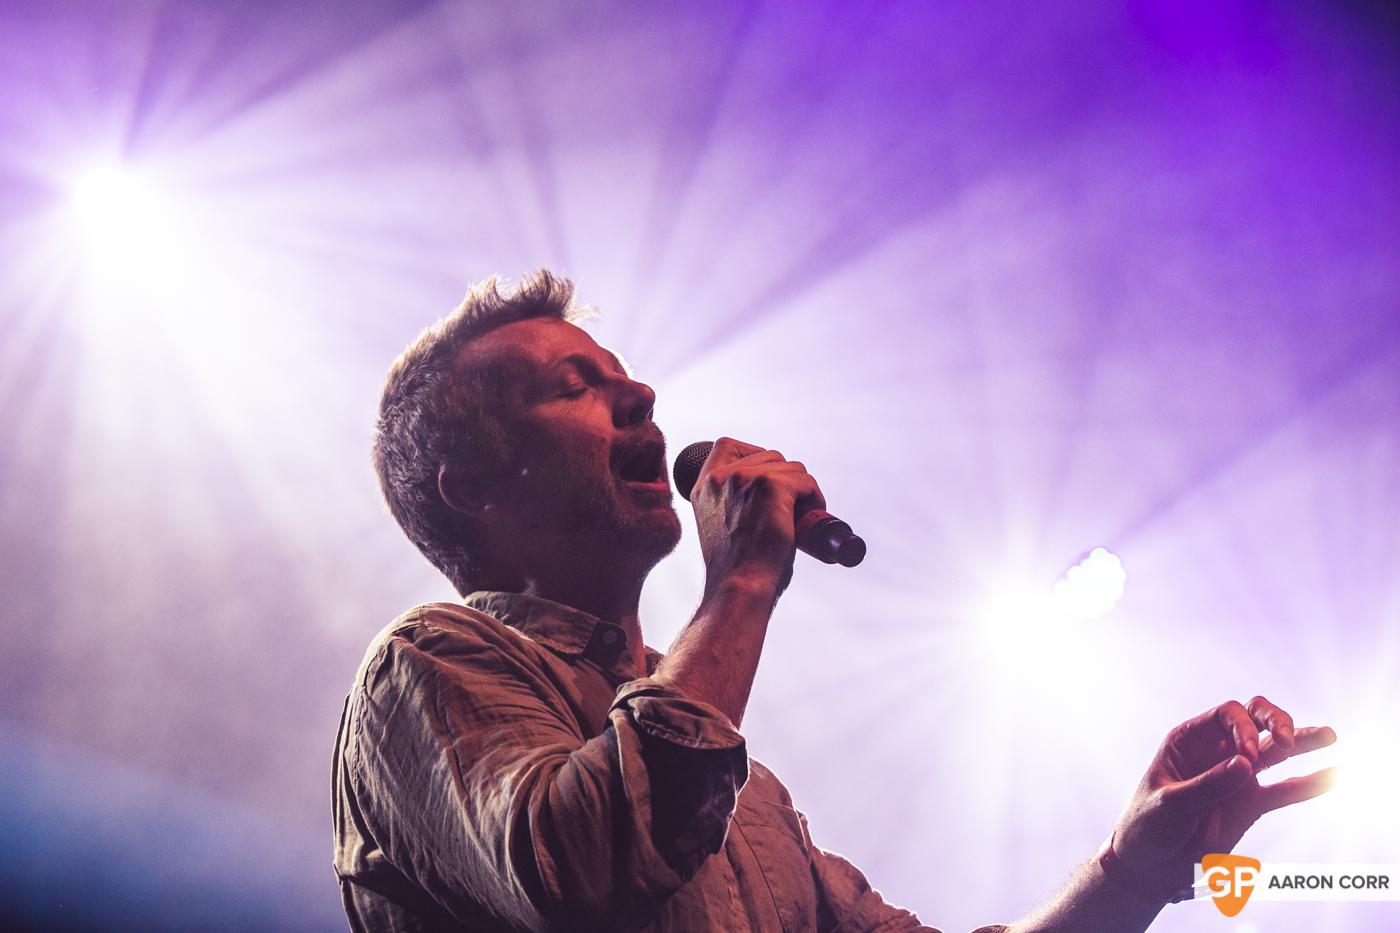 Daithi at Choice Music Prize 2020 in Vicar Street, Dublin on 05-Mar-20 by Aaron Corr-5362